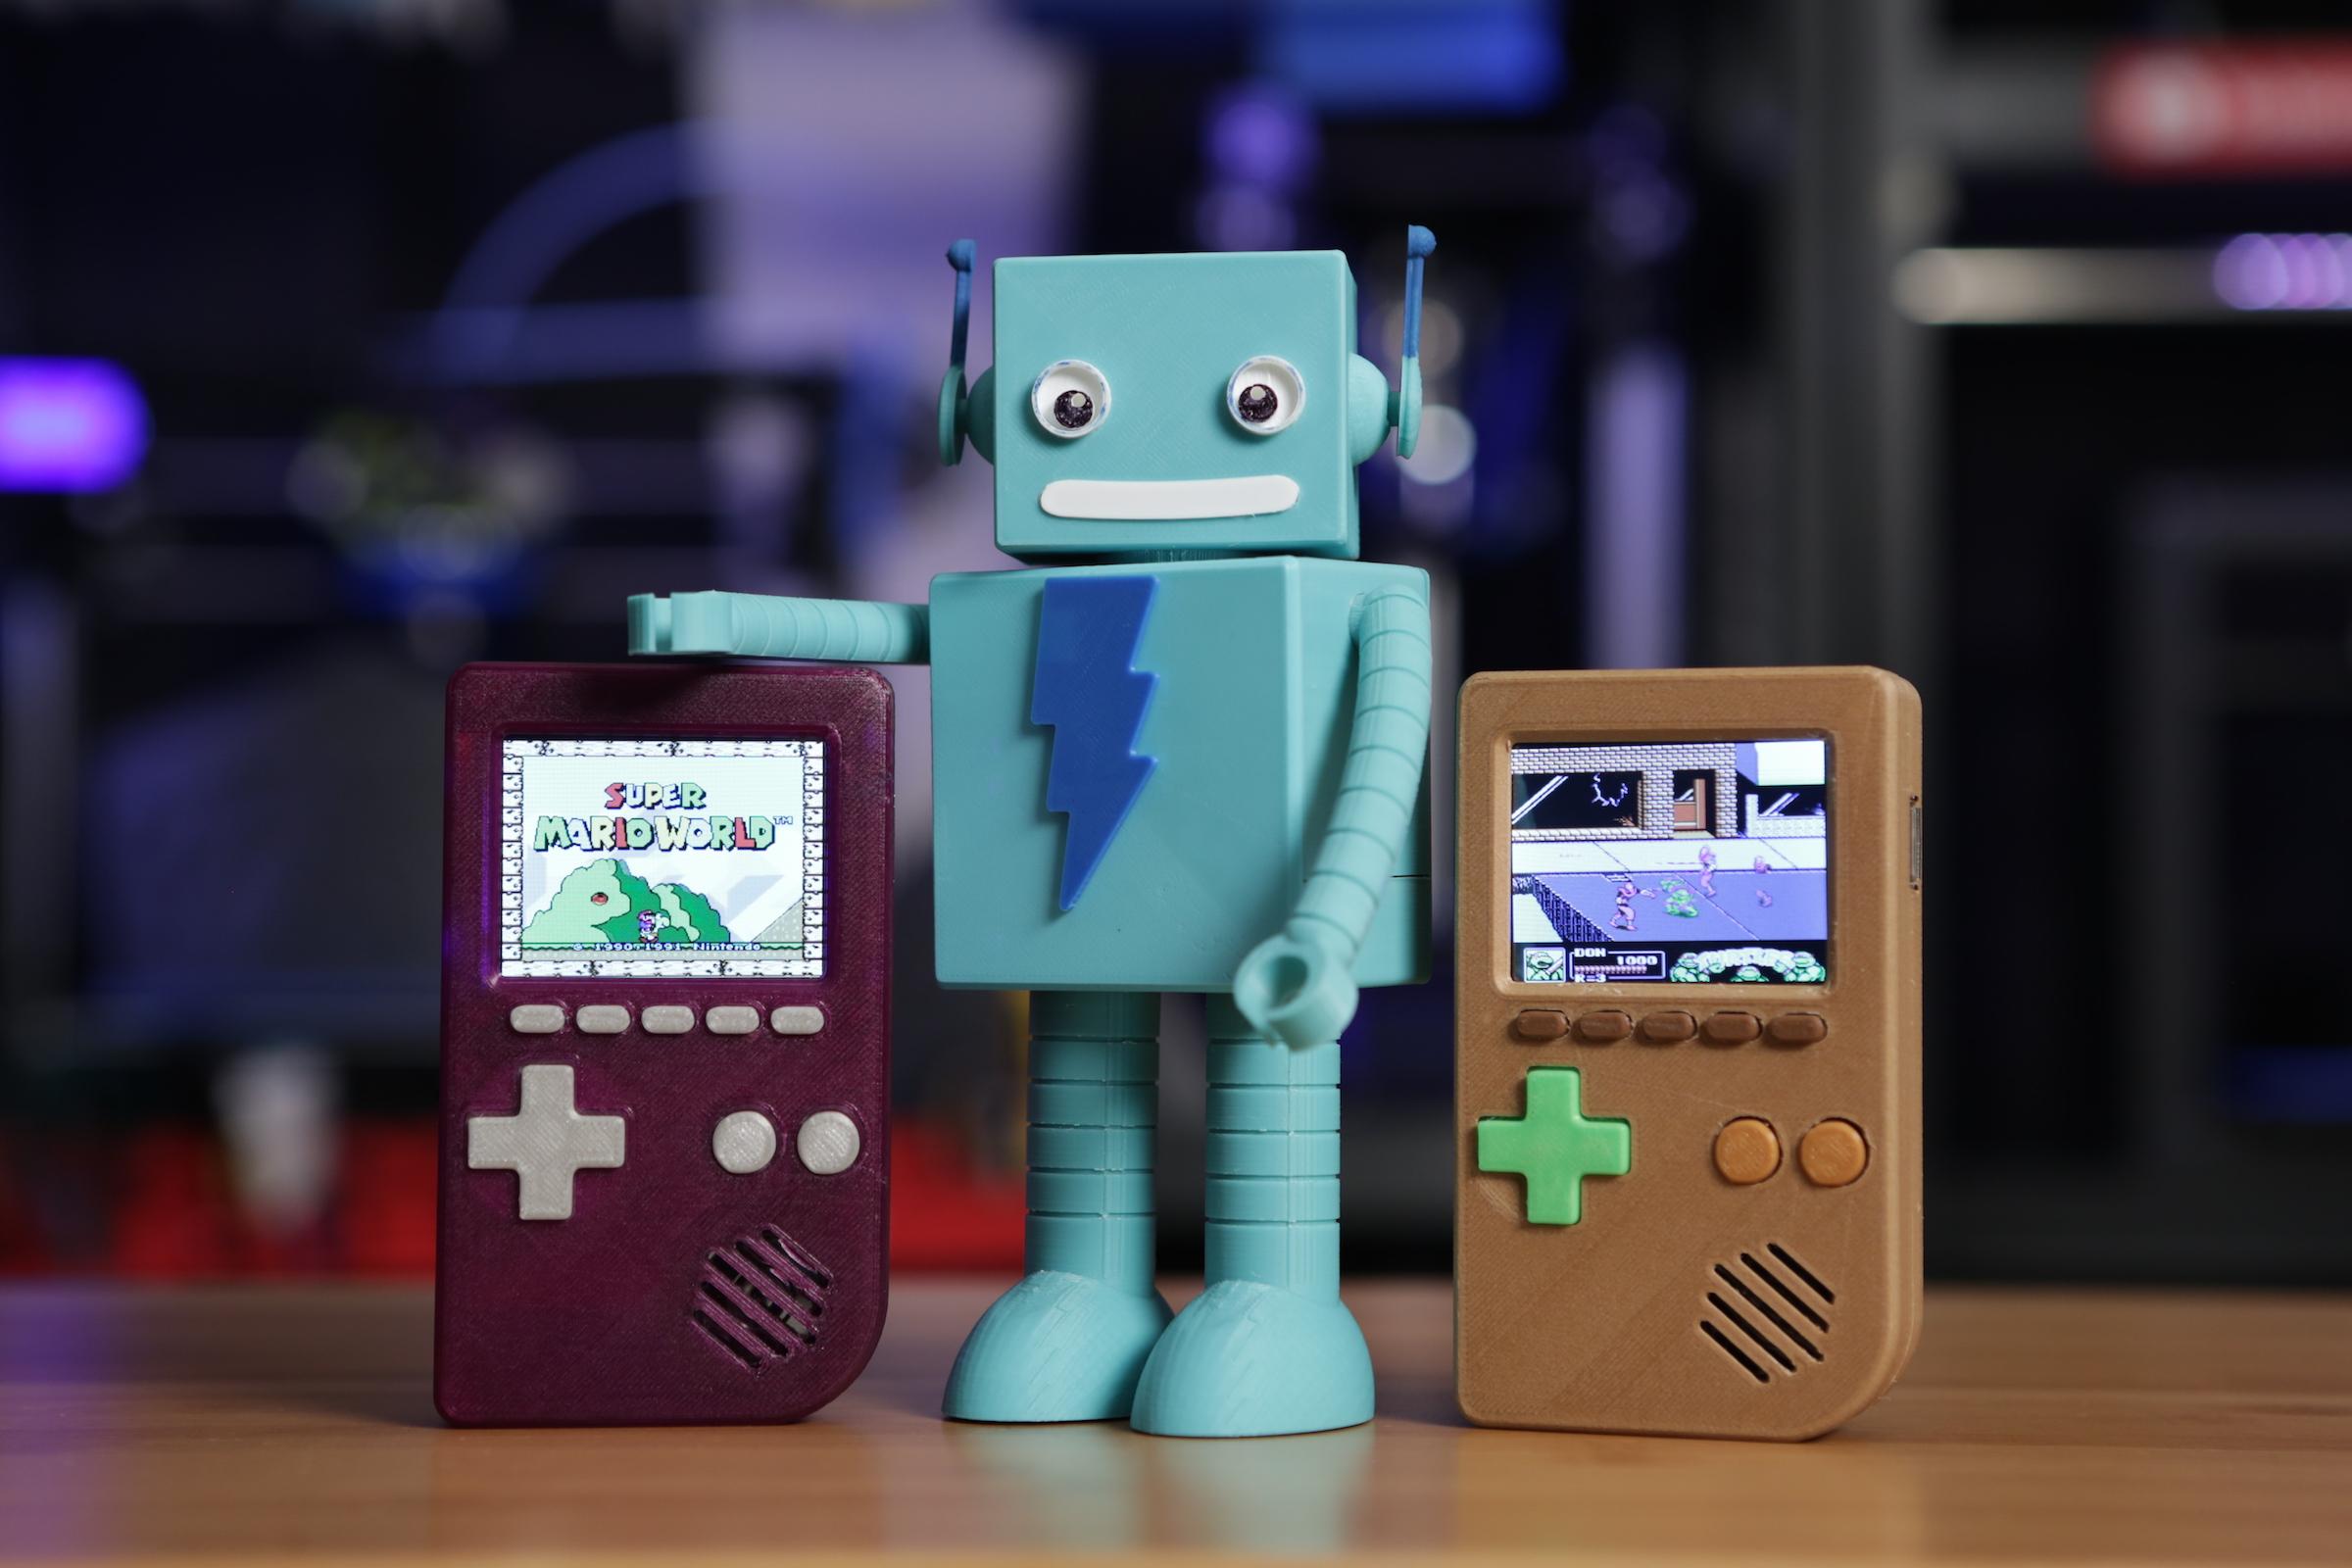 gaming_hero_adabot_double_smaller.jpeg